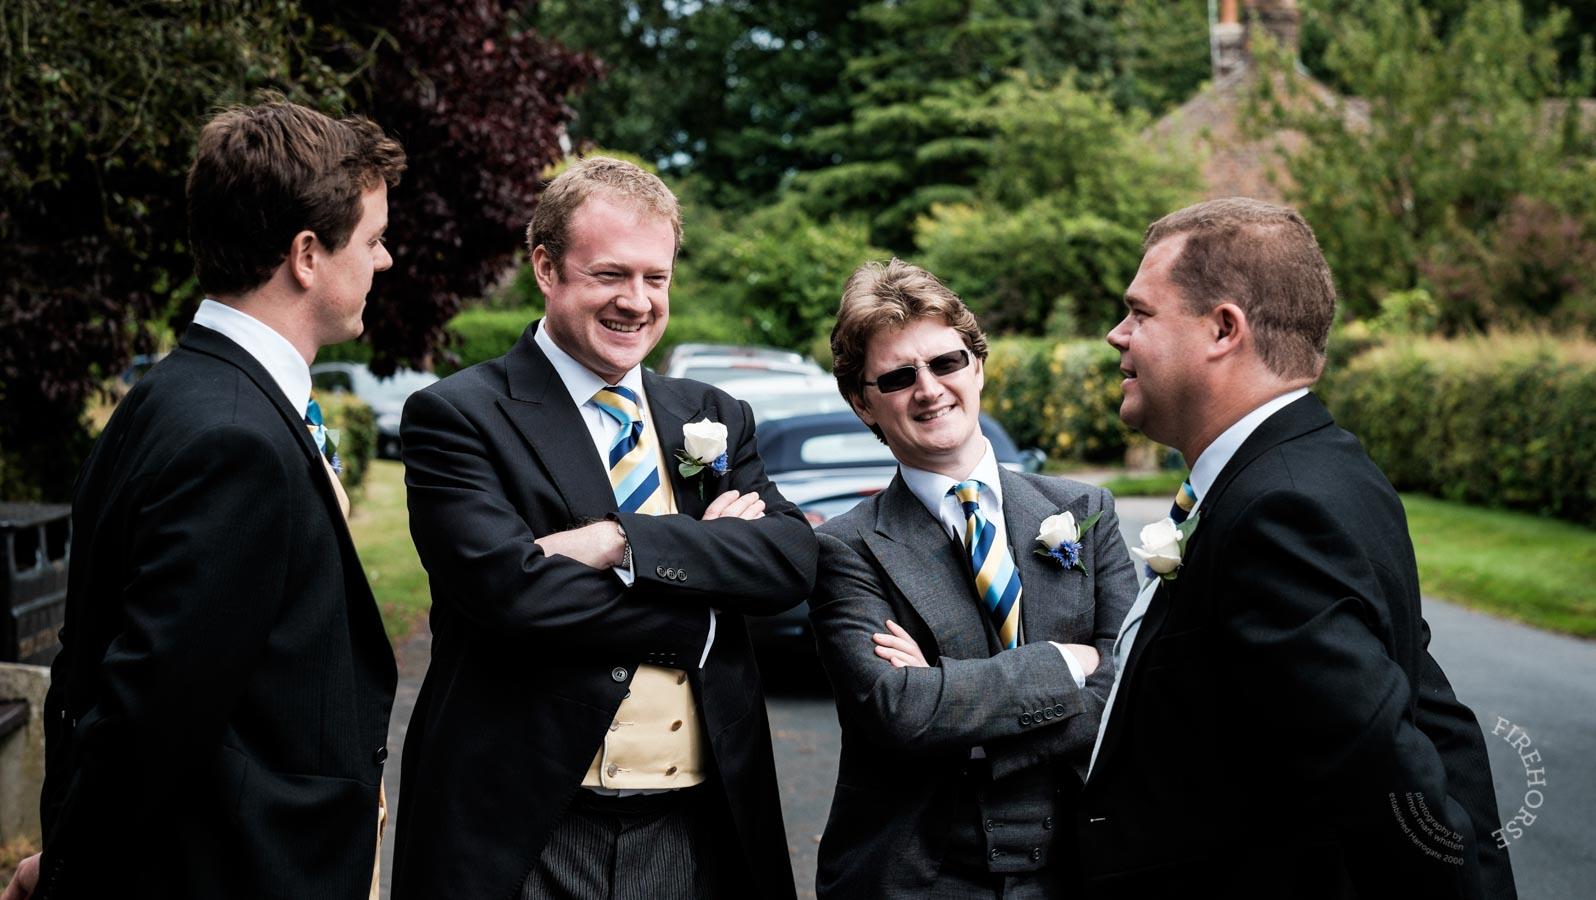 East-Yorkshire-Wedding-062